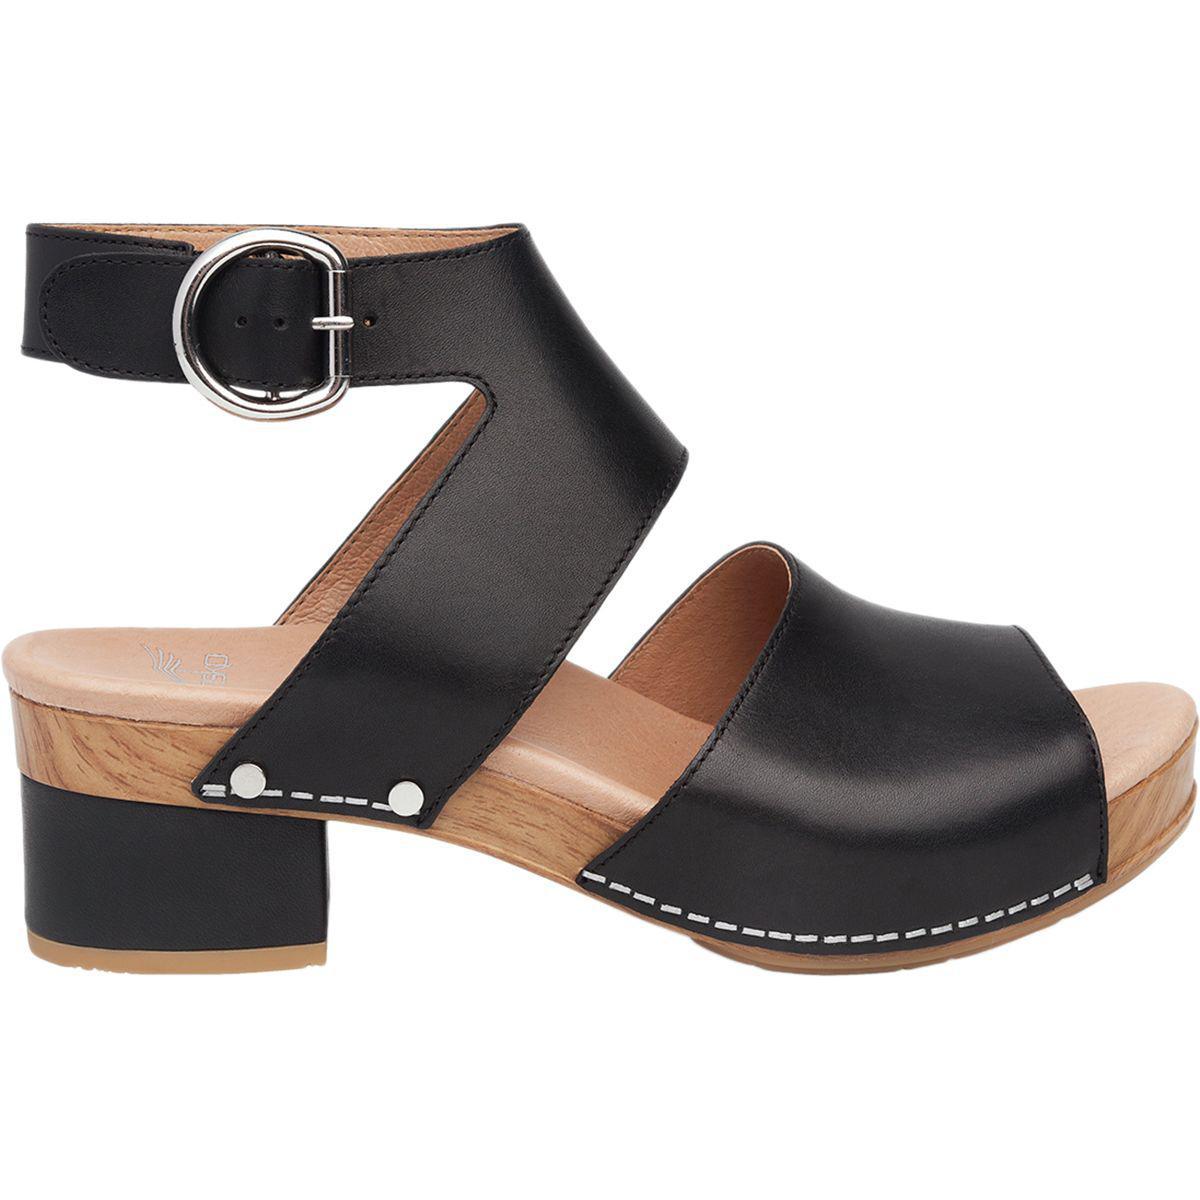 Minka Ankle Strap Block Heel Sandals cRW2pC